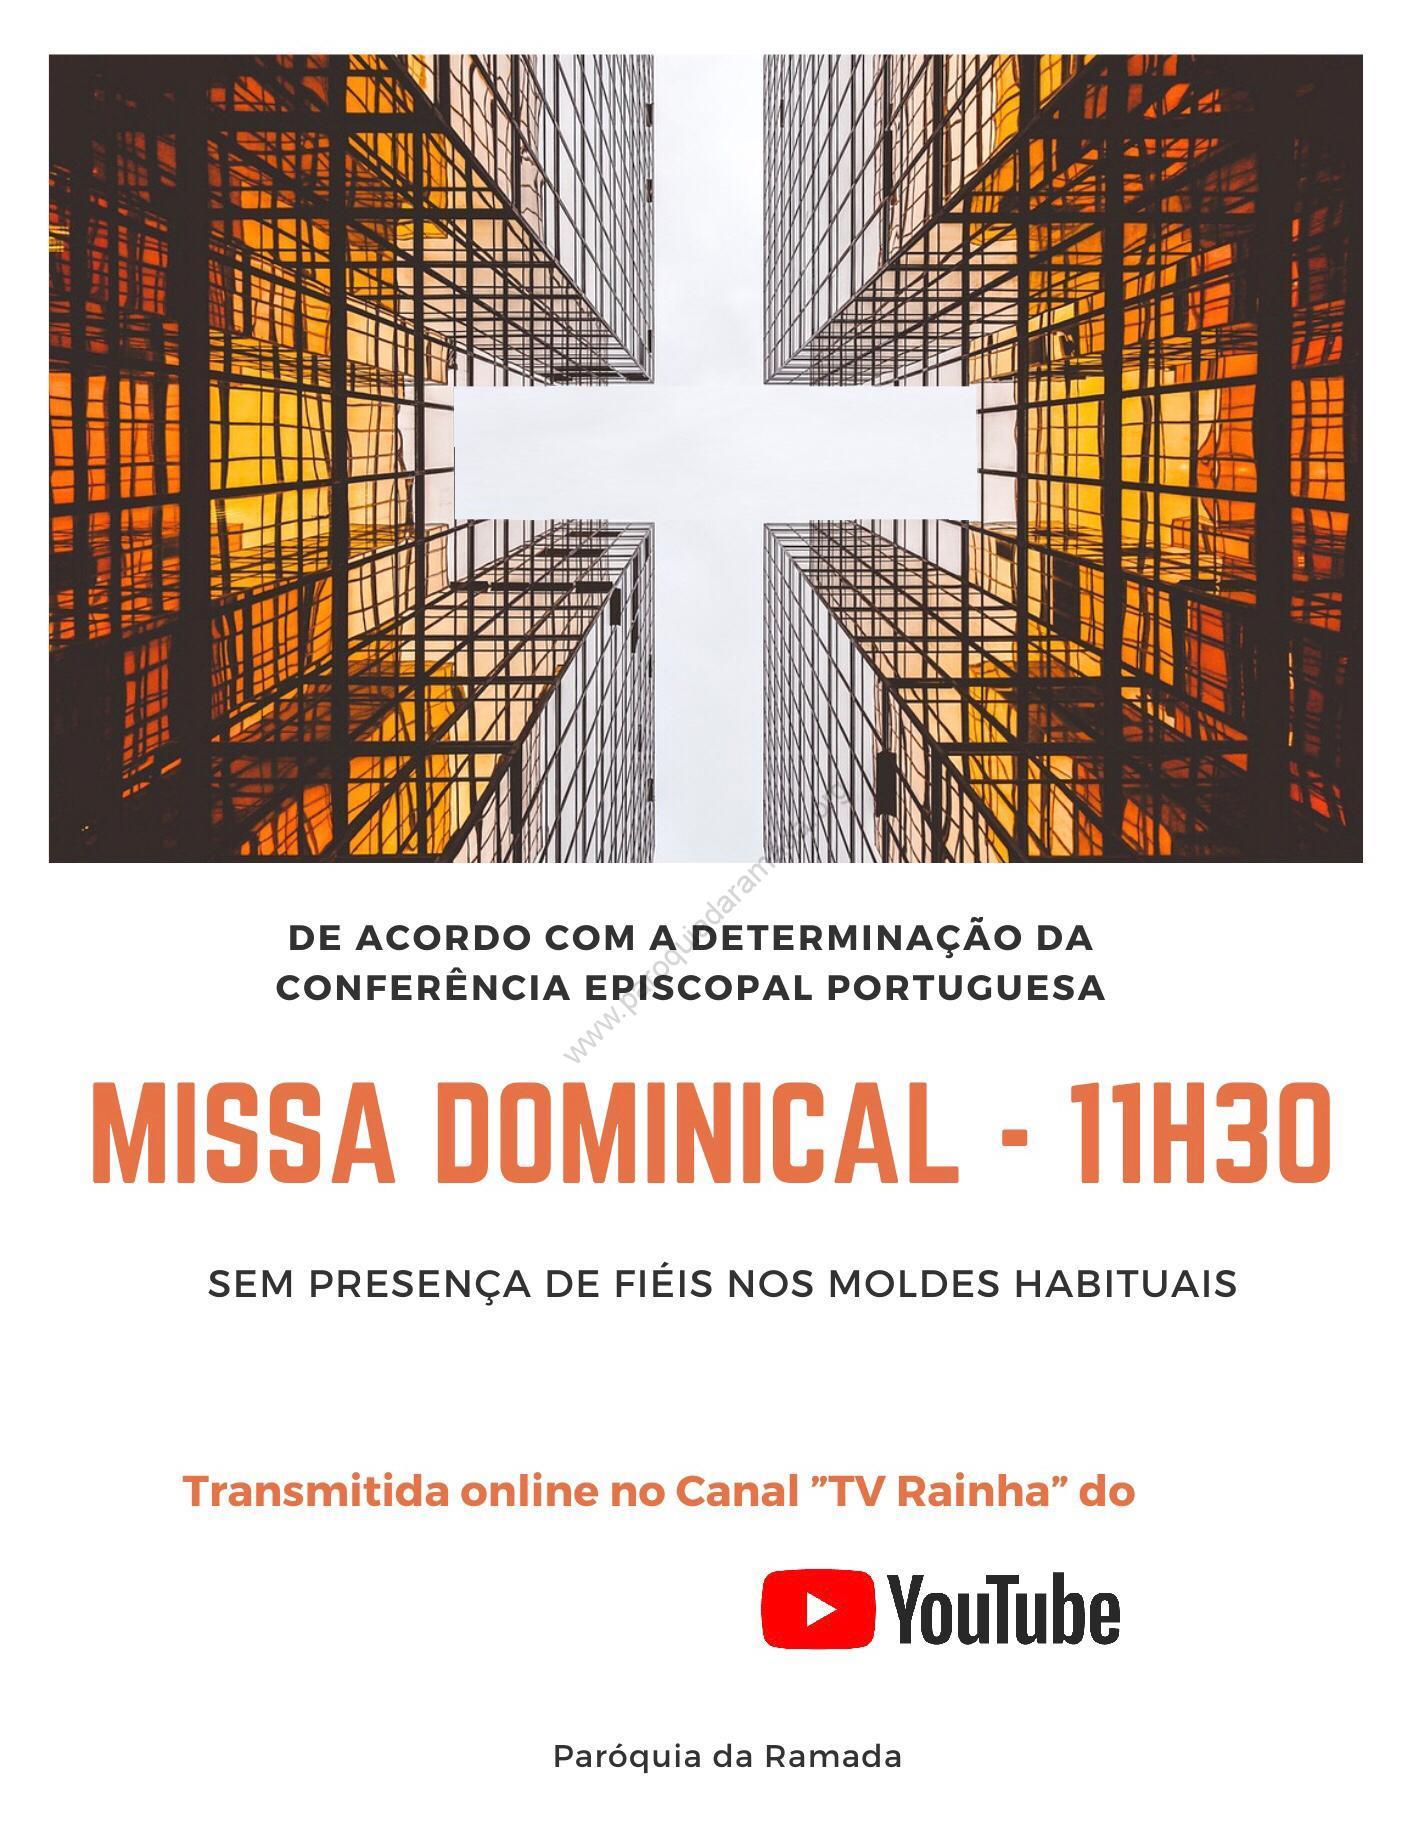 Missa Dominical